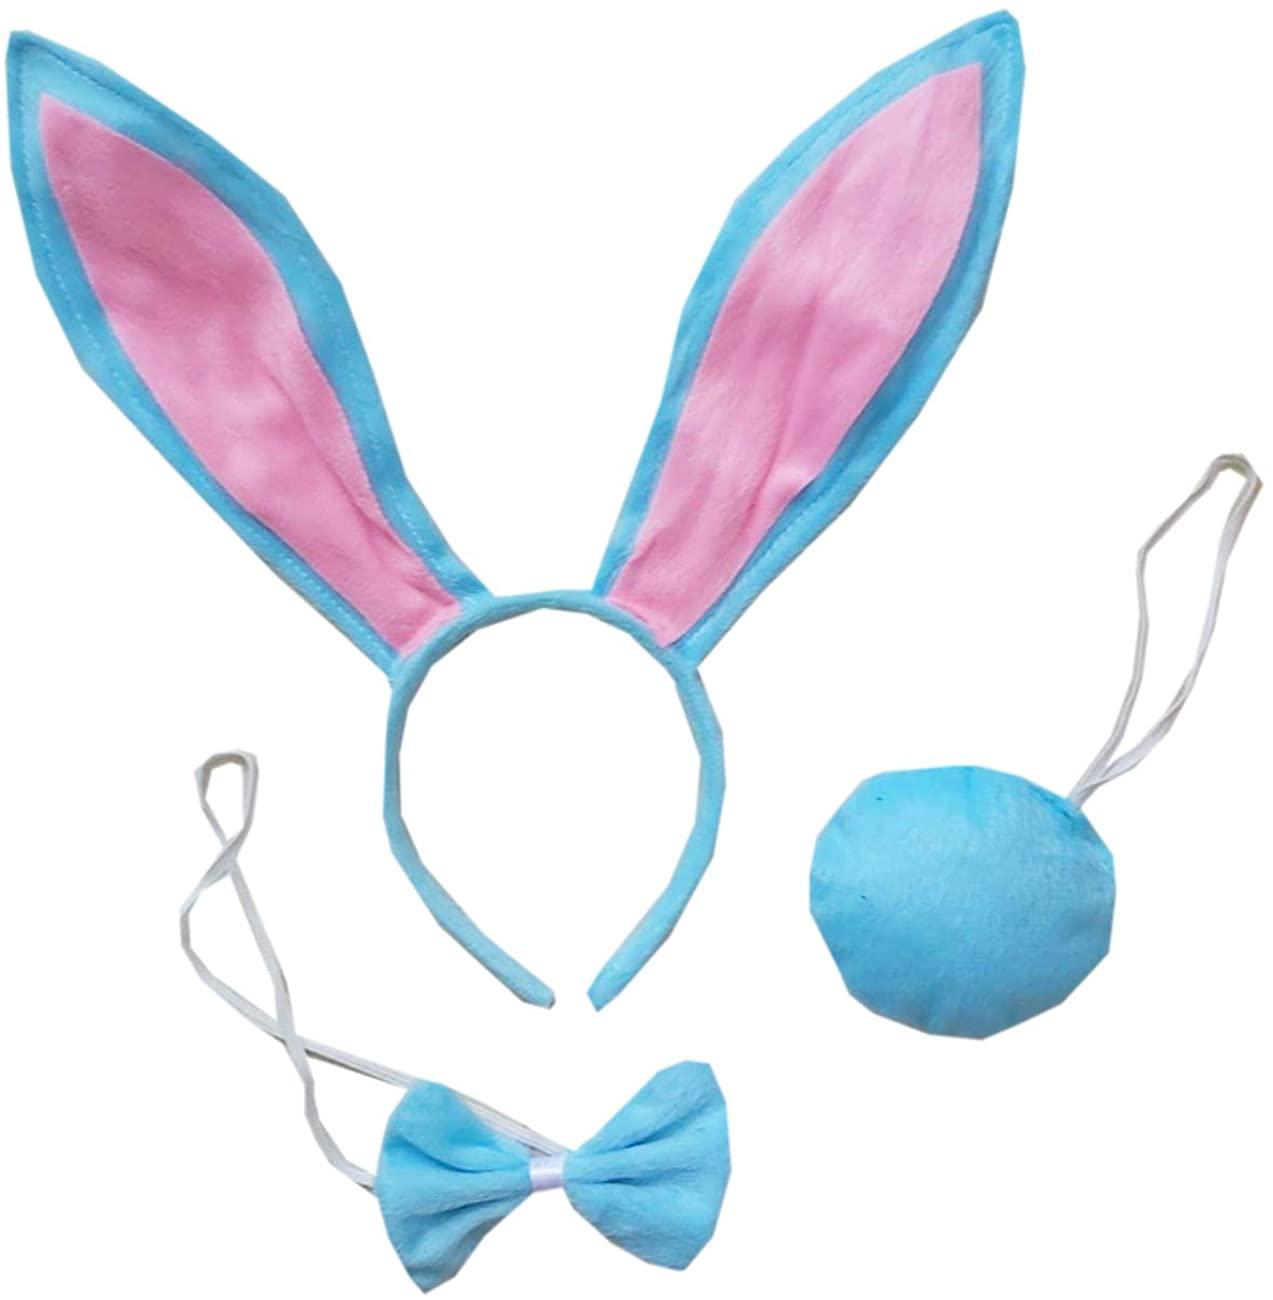 Kirei Sui Blue Bunny Headband Bowtie Tail 3pcs Costume